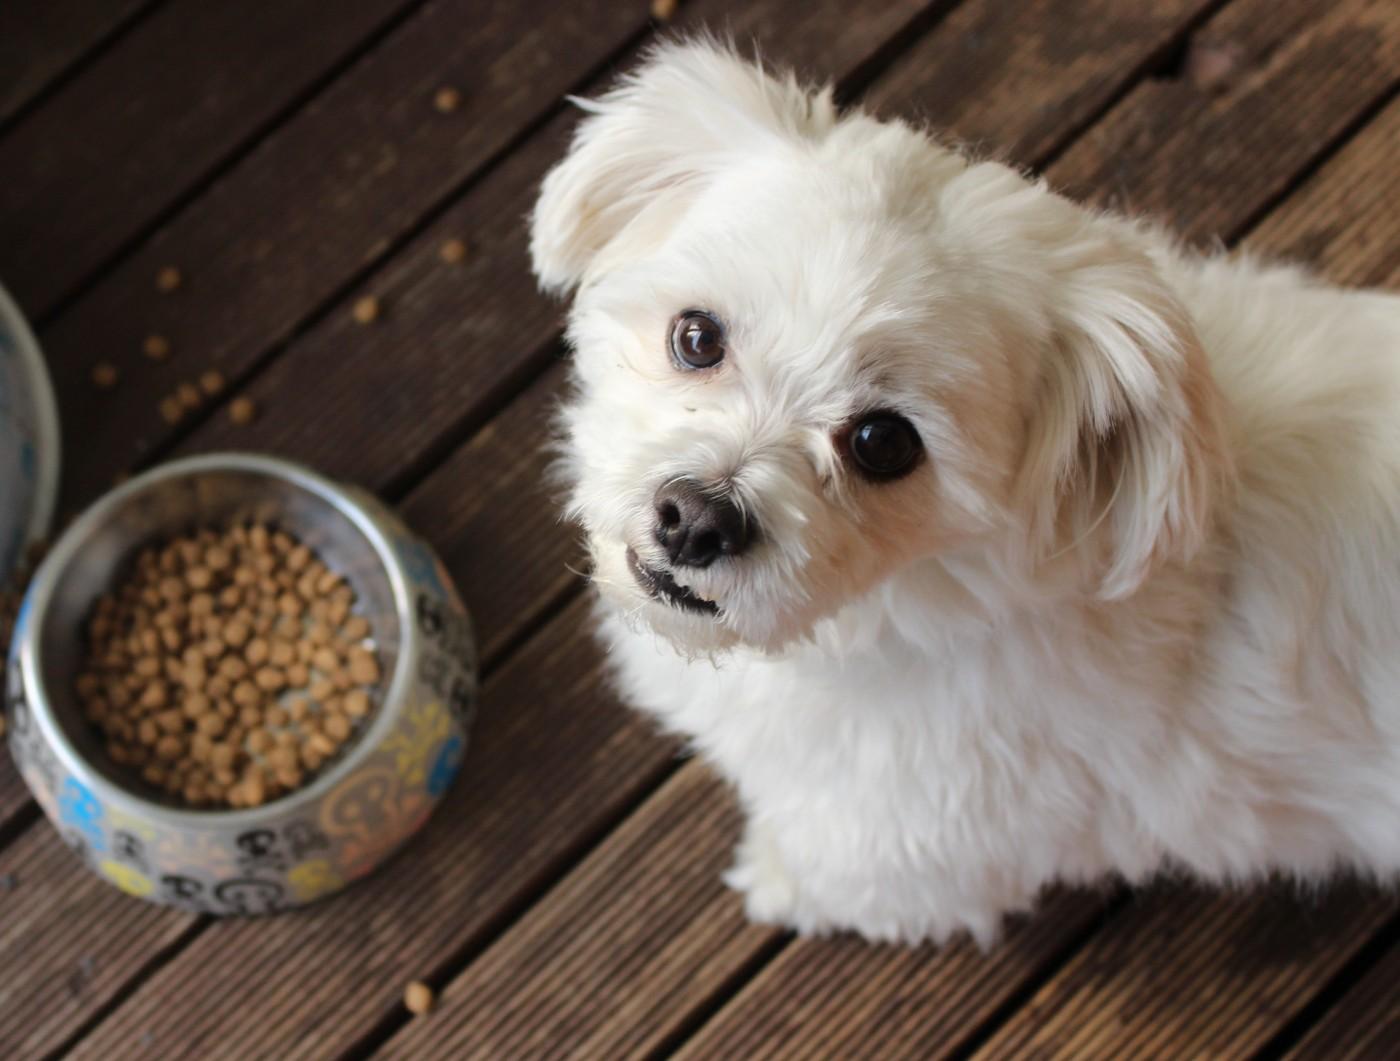 Sunshine Mills Once Again Pulls Dog Food Brands From Shelves